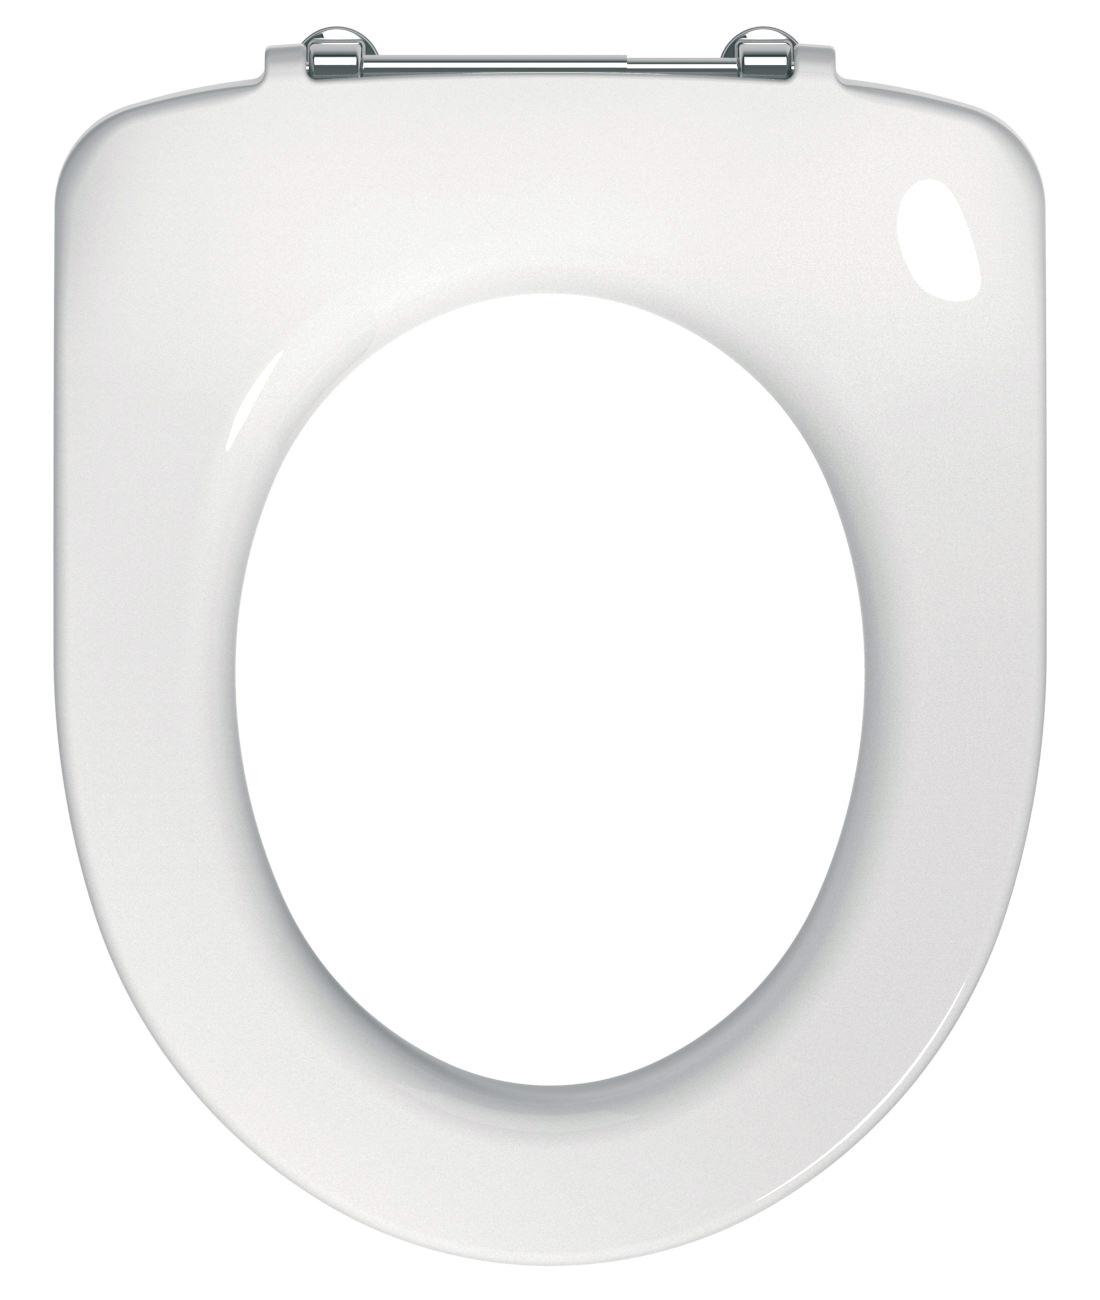 Toilet Seat Top Fix Hinge Pack